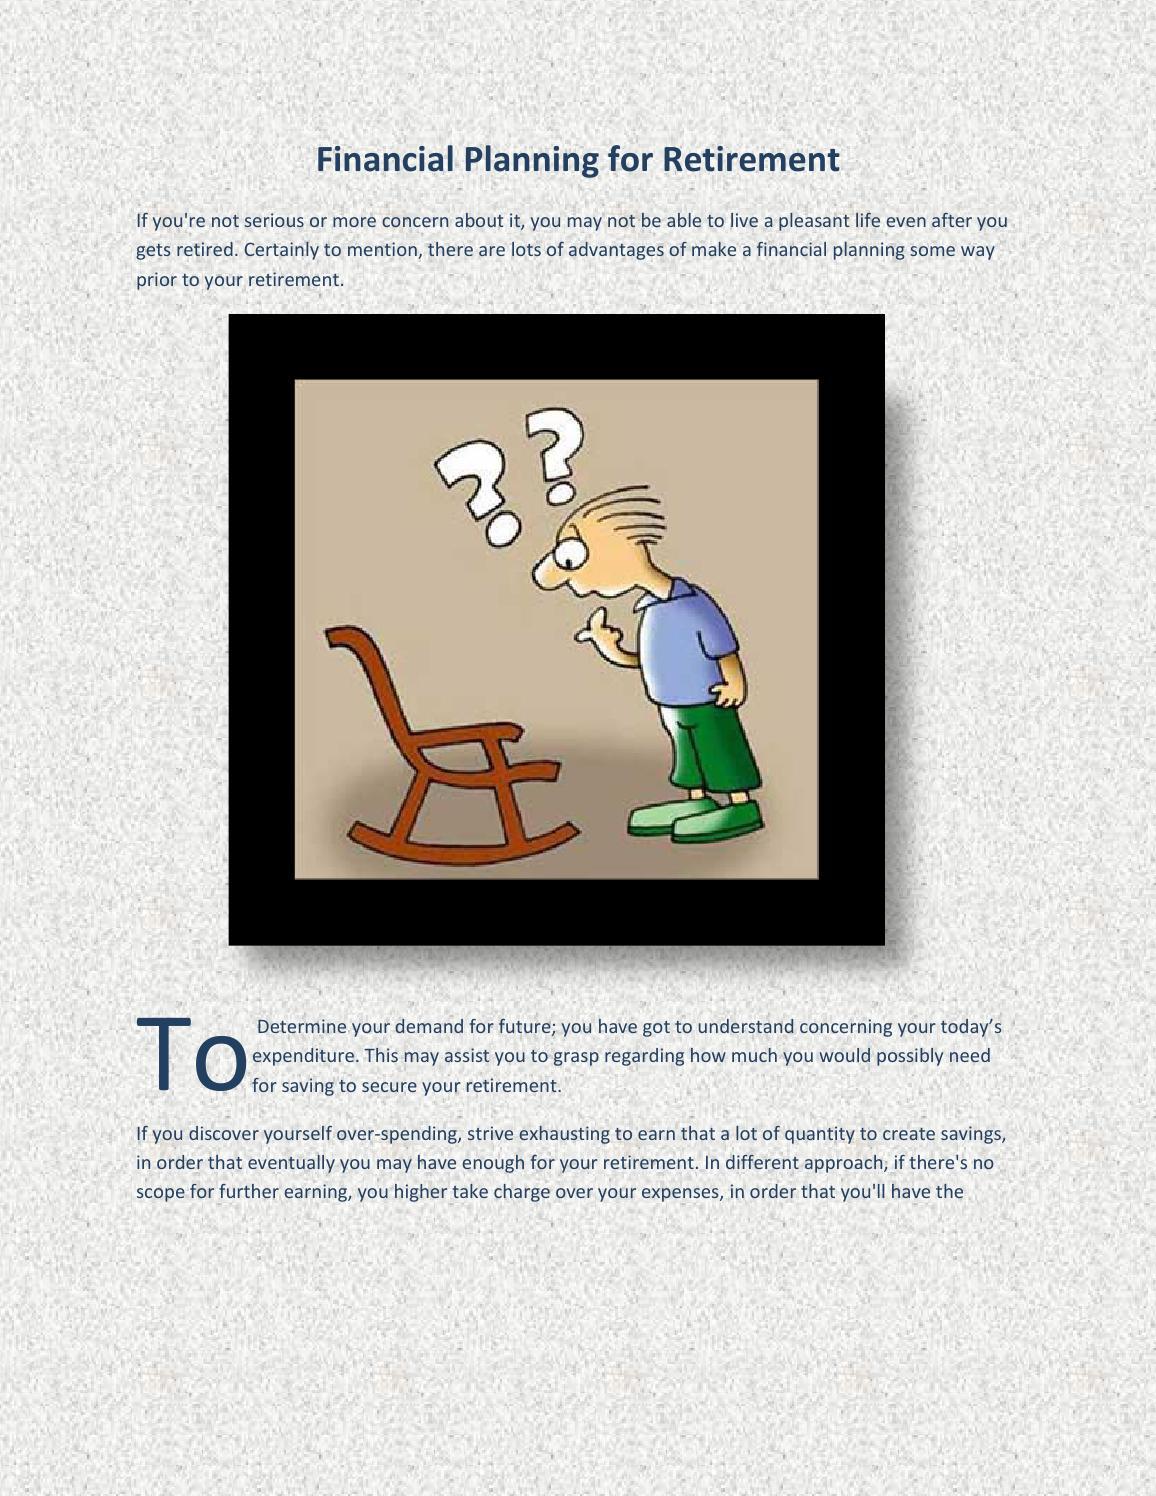 Financial Planning for Retirement by Joelharrisonau - issuu